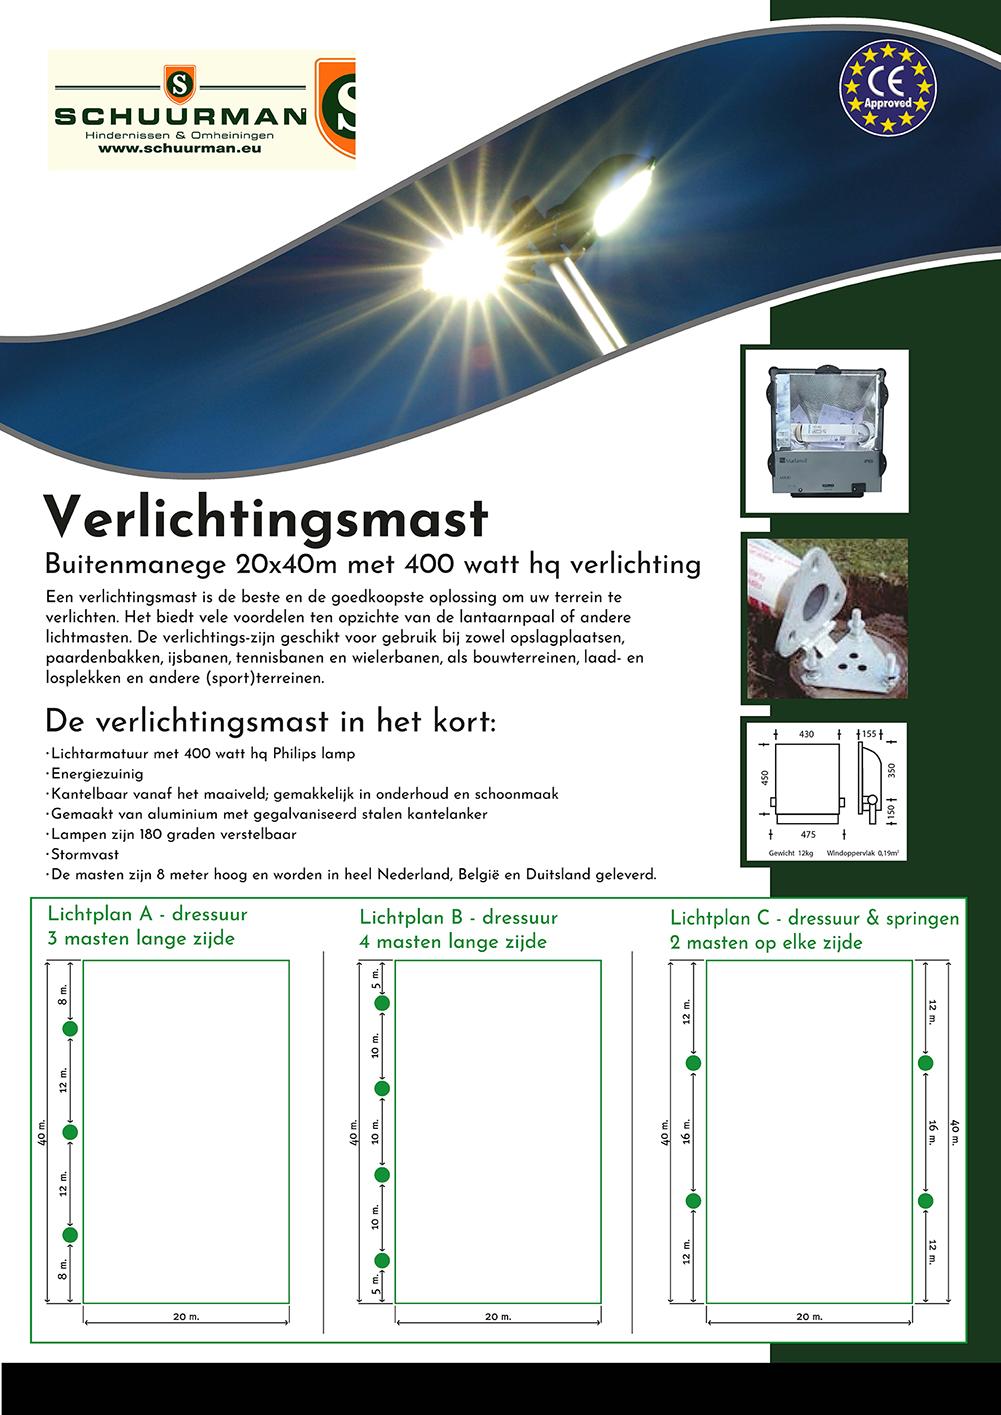 Brochure-buitenmanege-20x40 v3